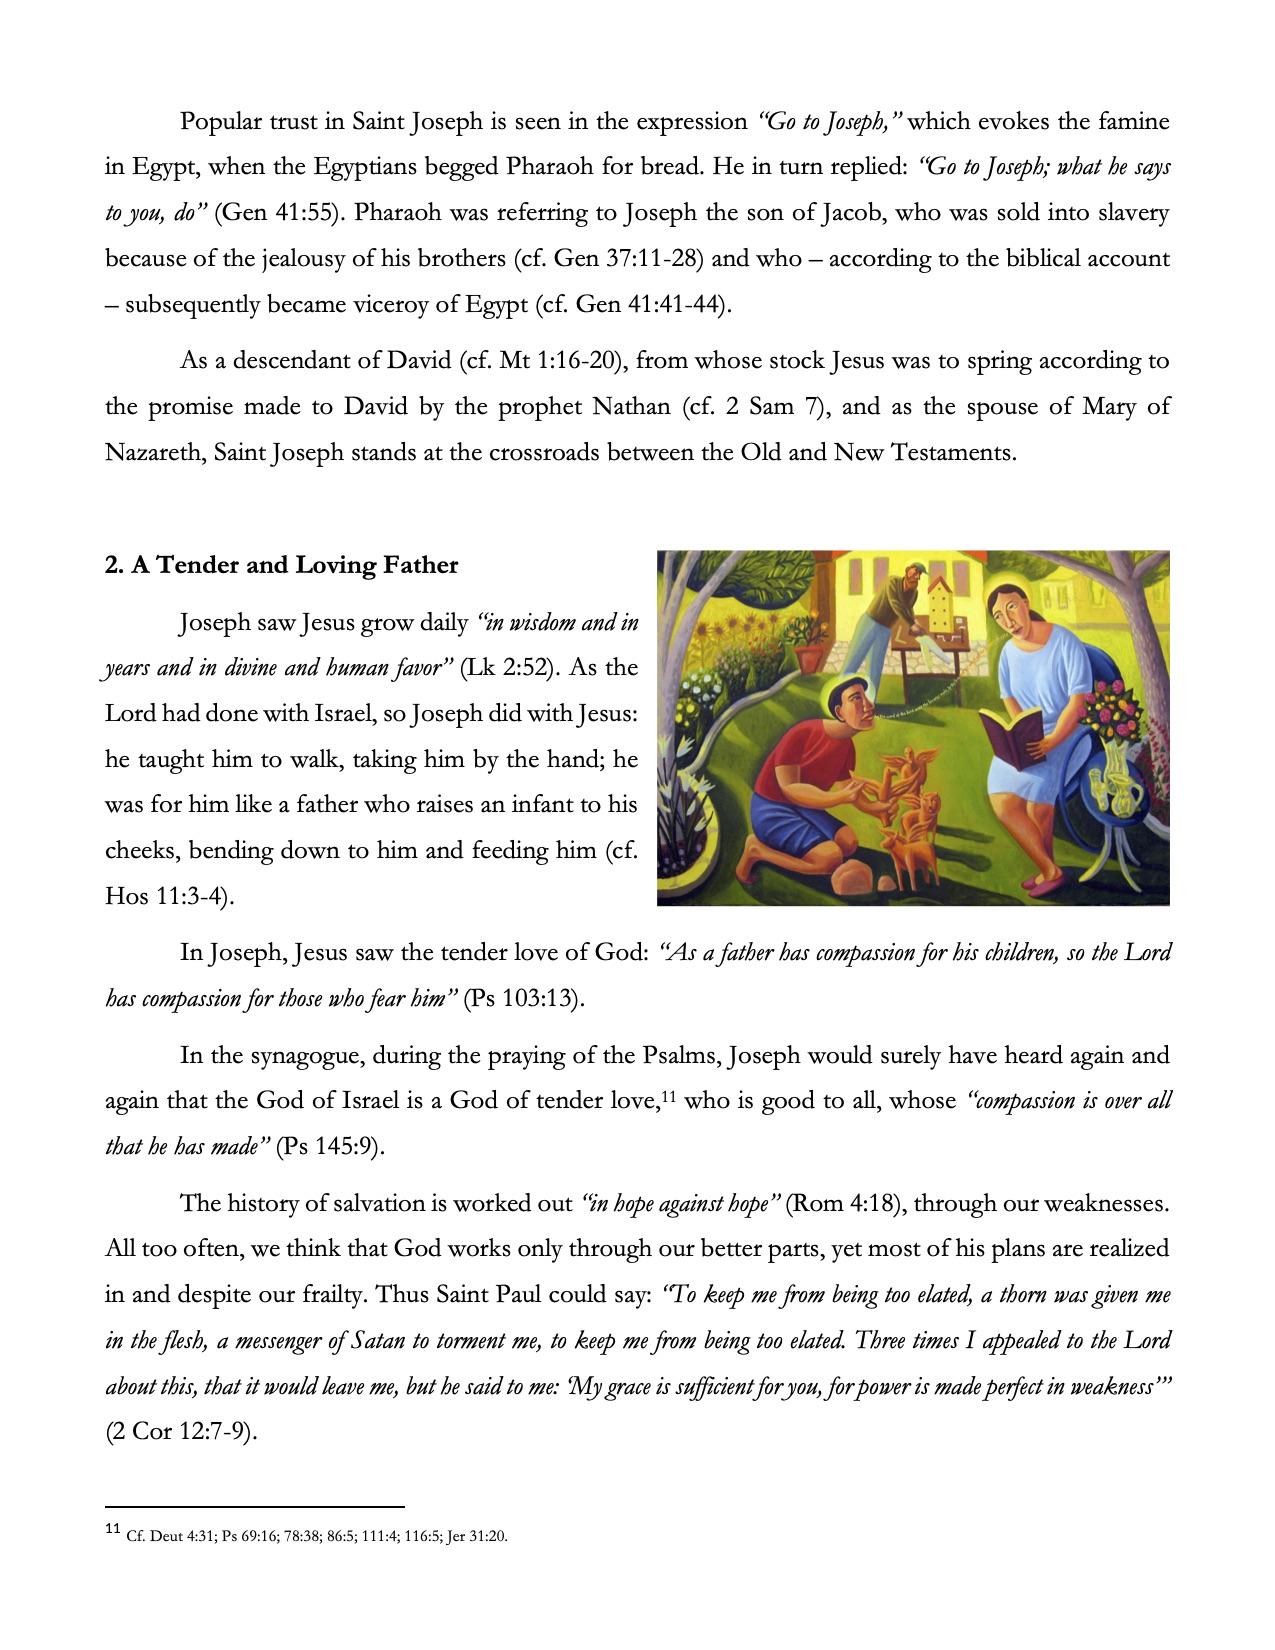 04-APOSTOLIC LETTER